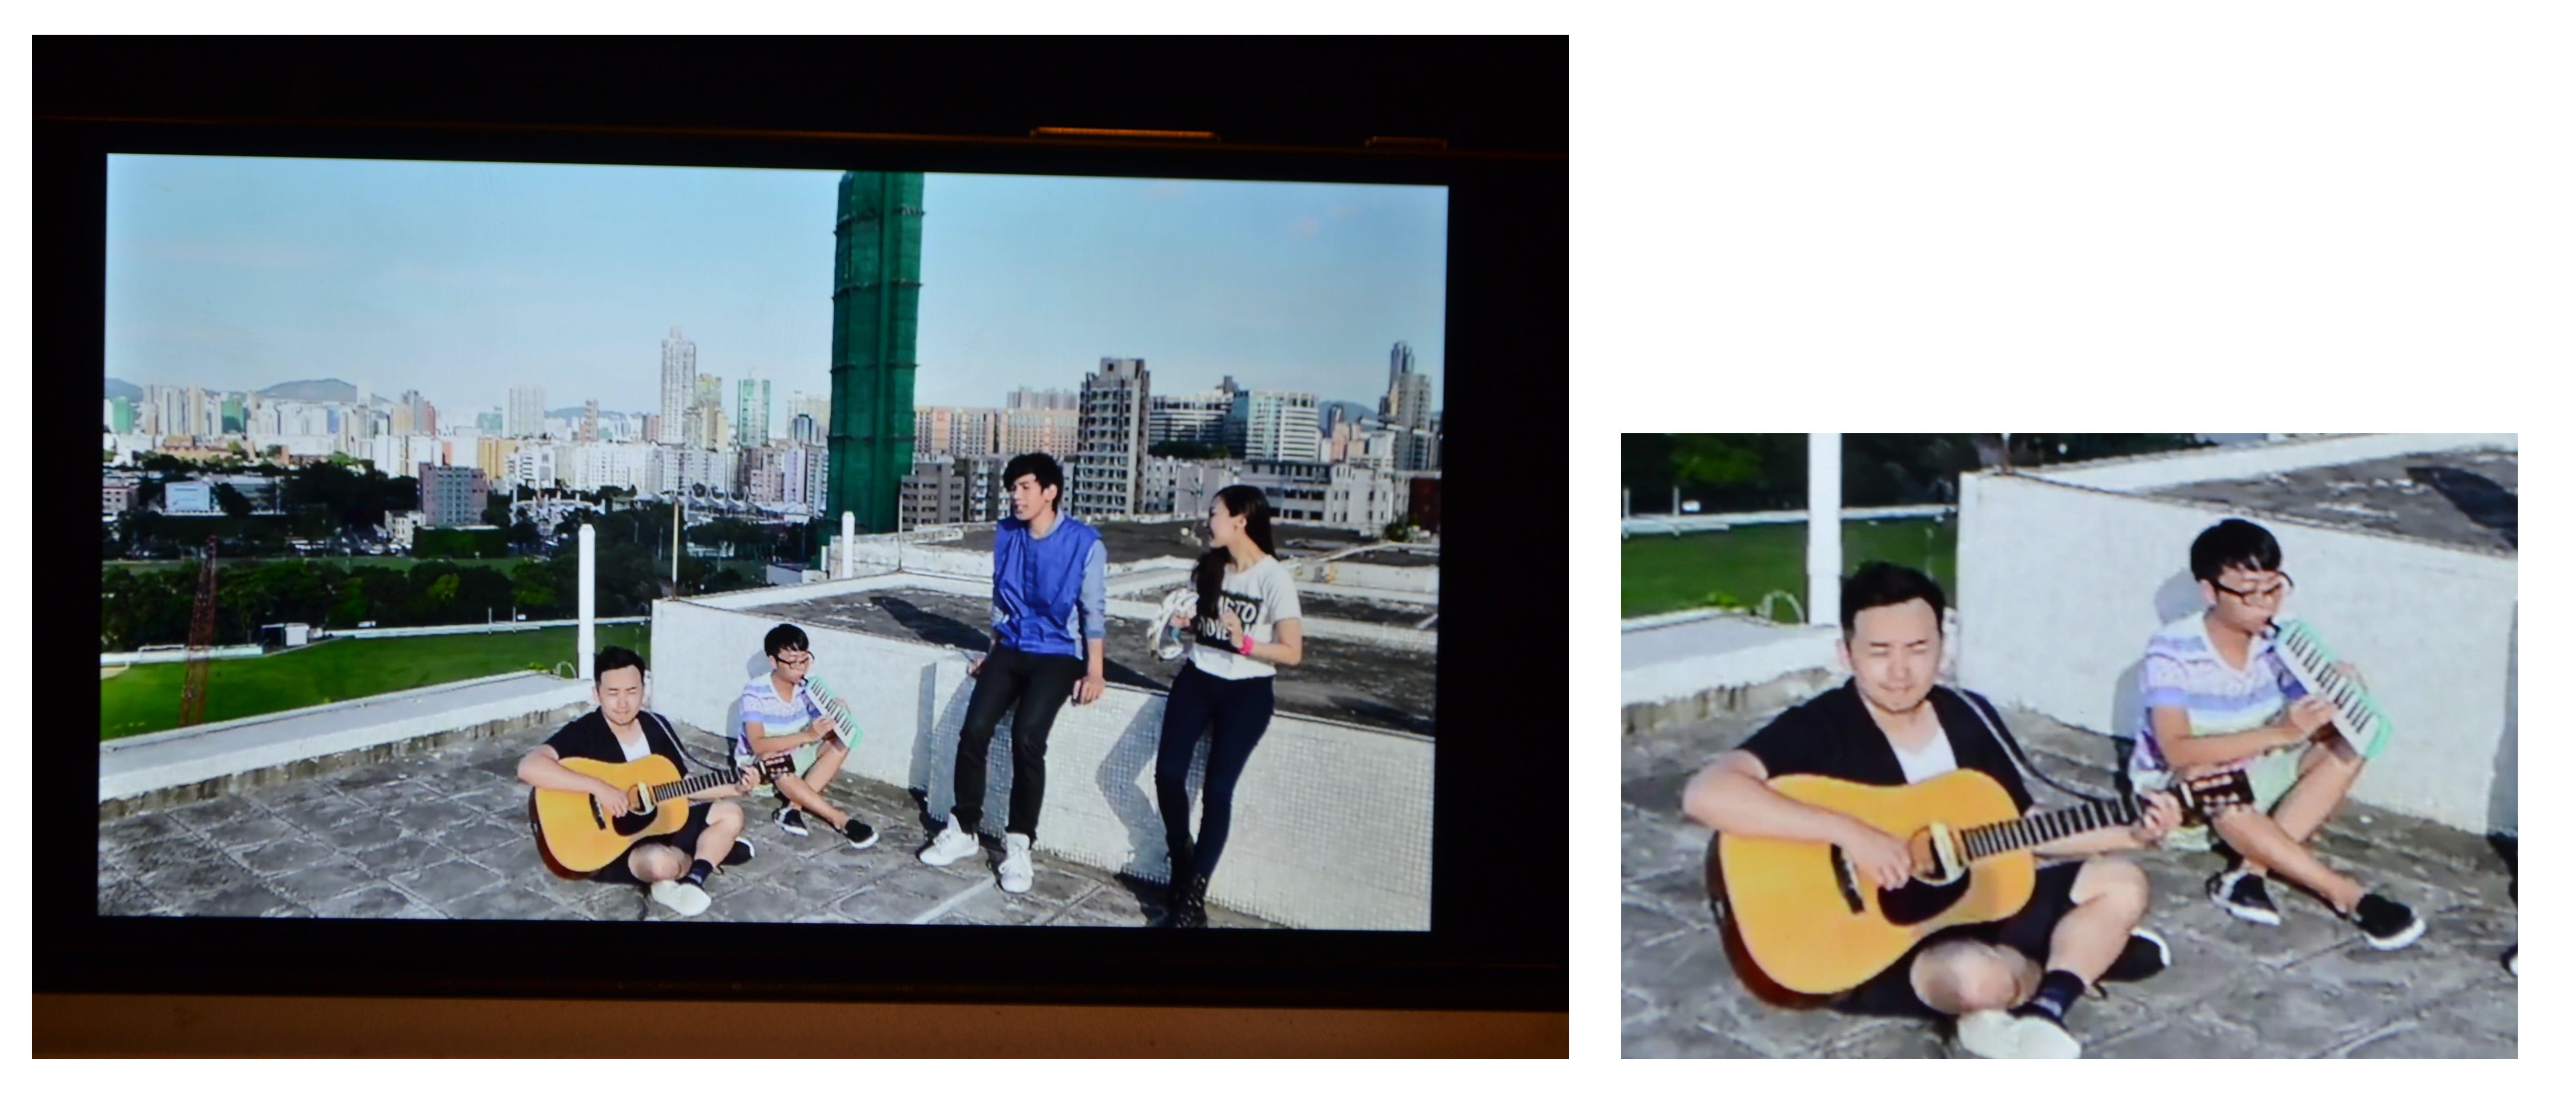 720p-Video_XZ5P-min